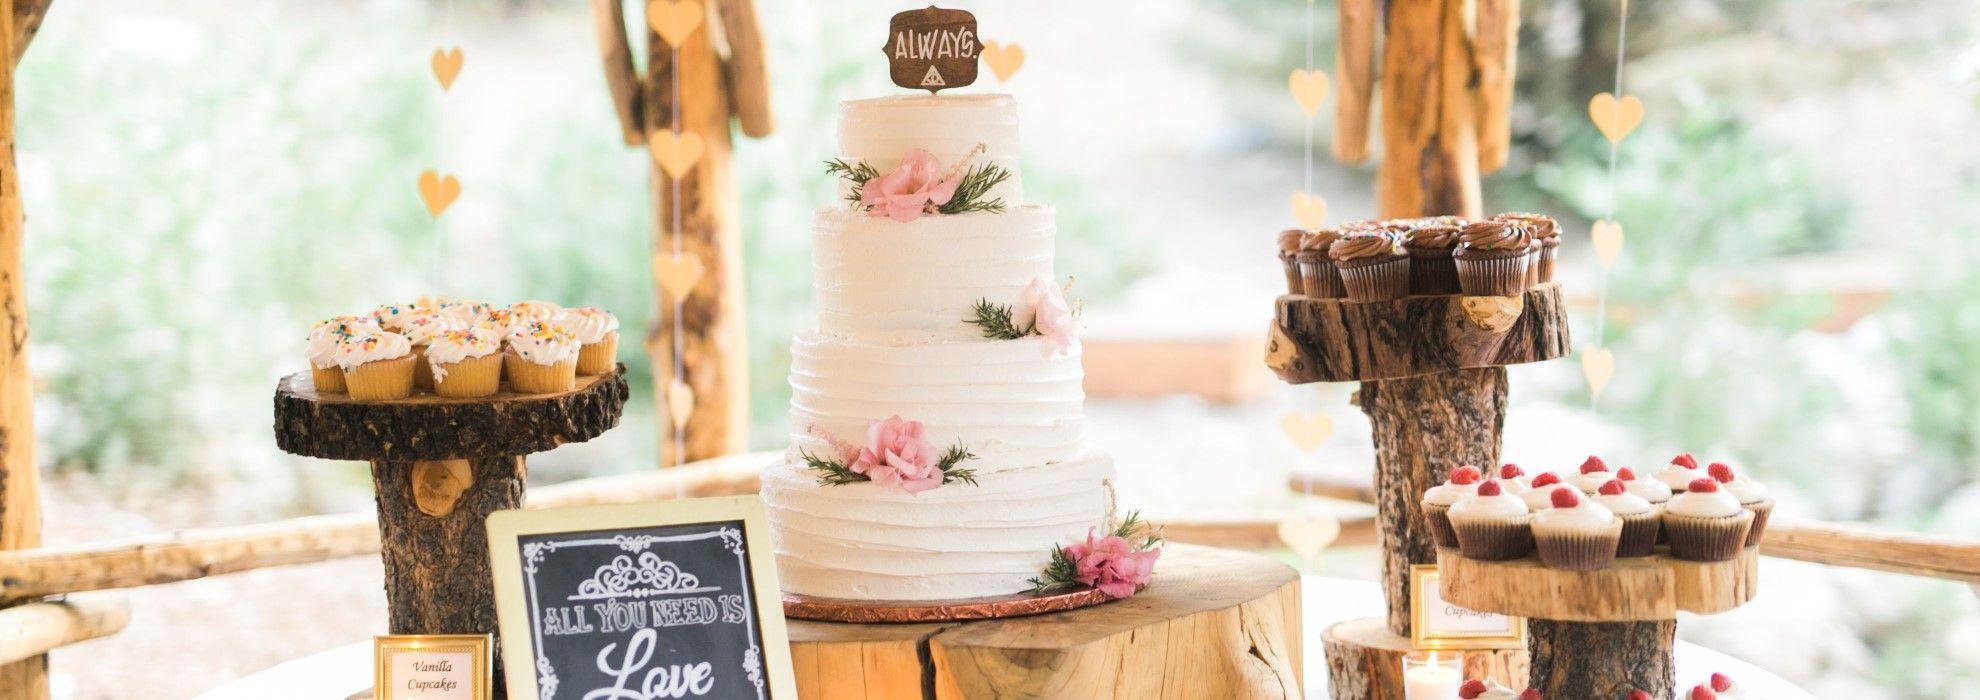 cake gazebo Pine rose forest wedding-maxWx700.jpg